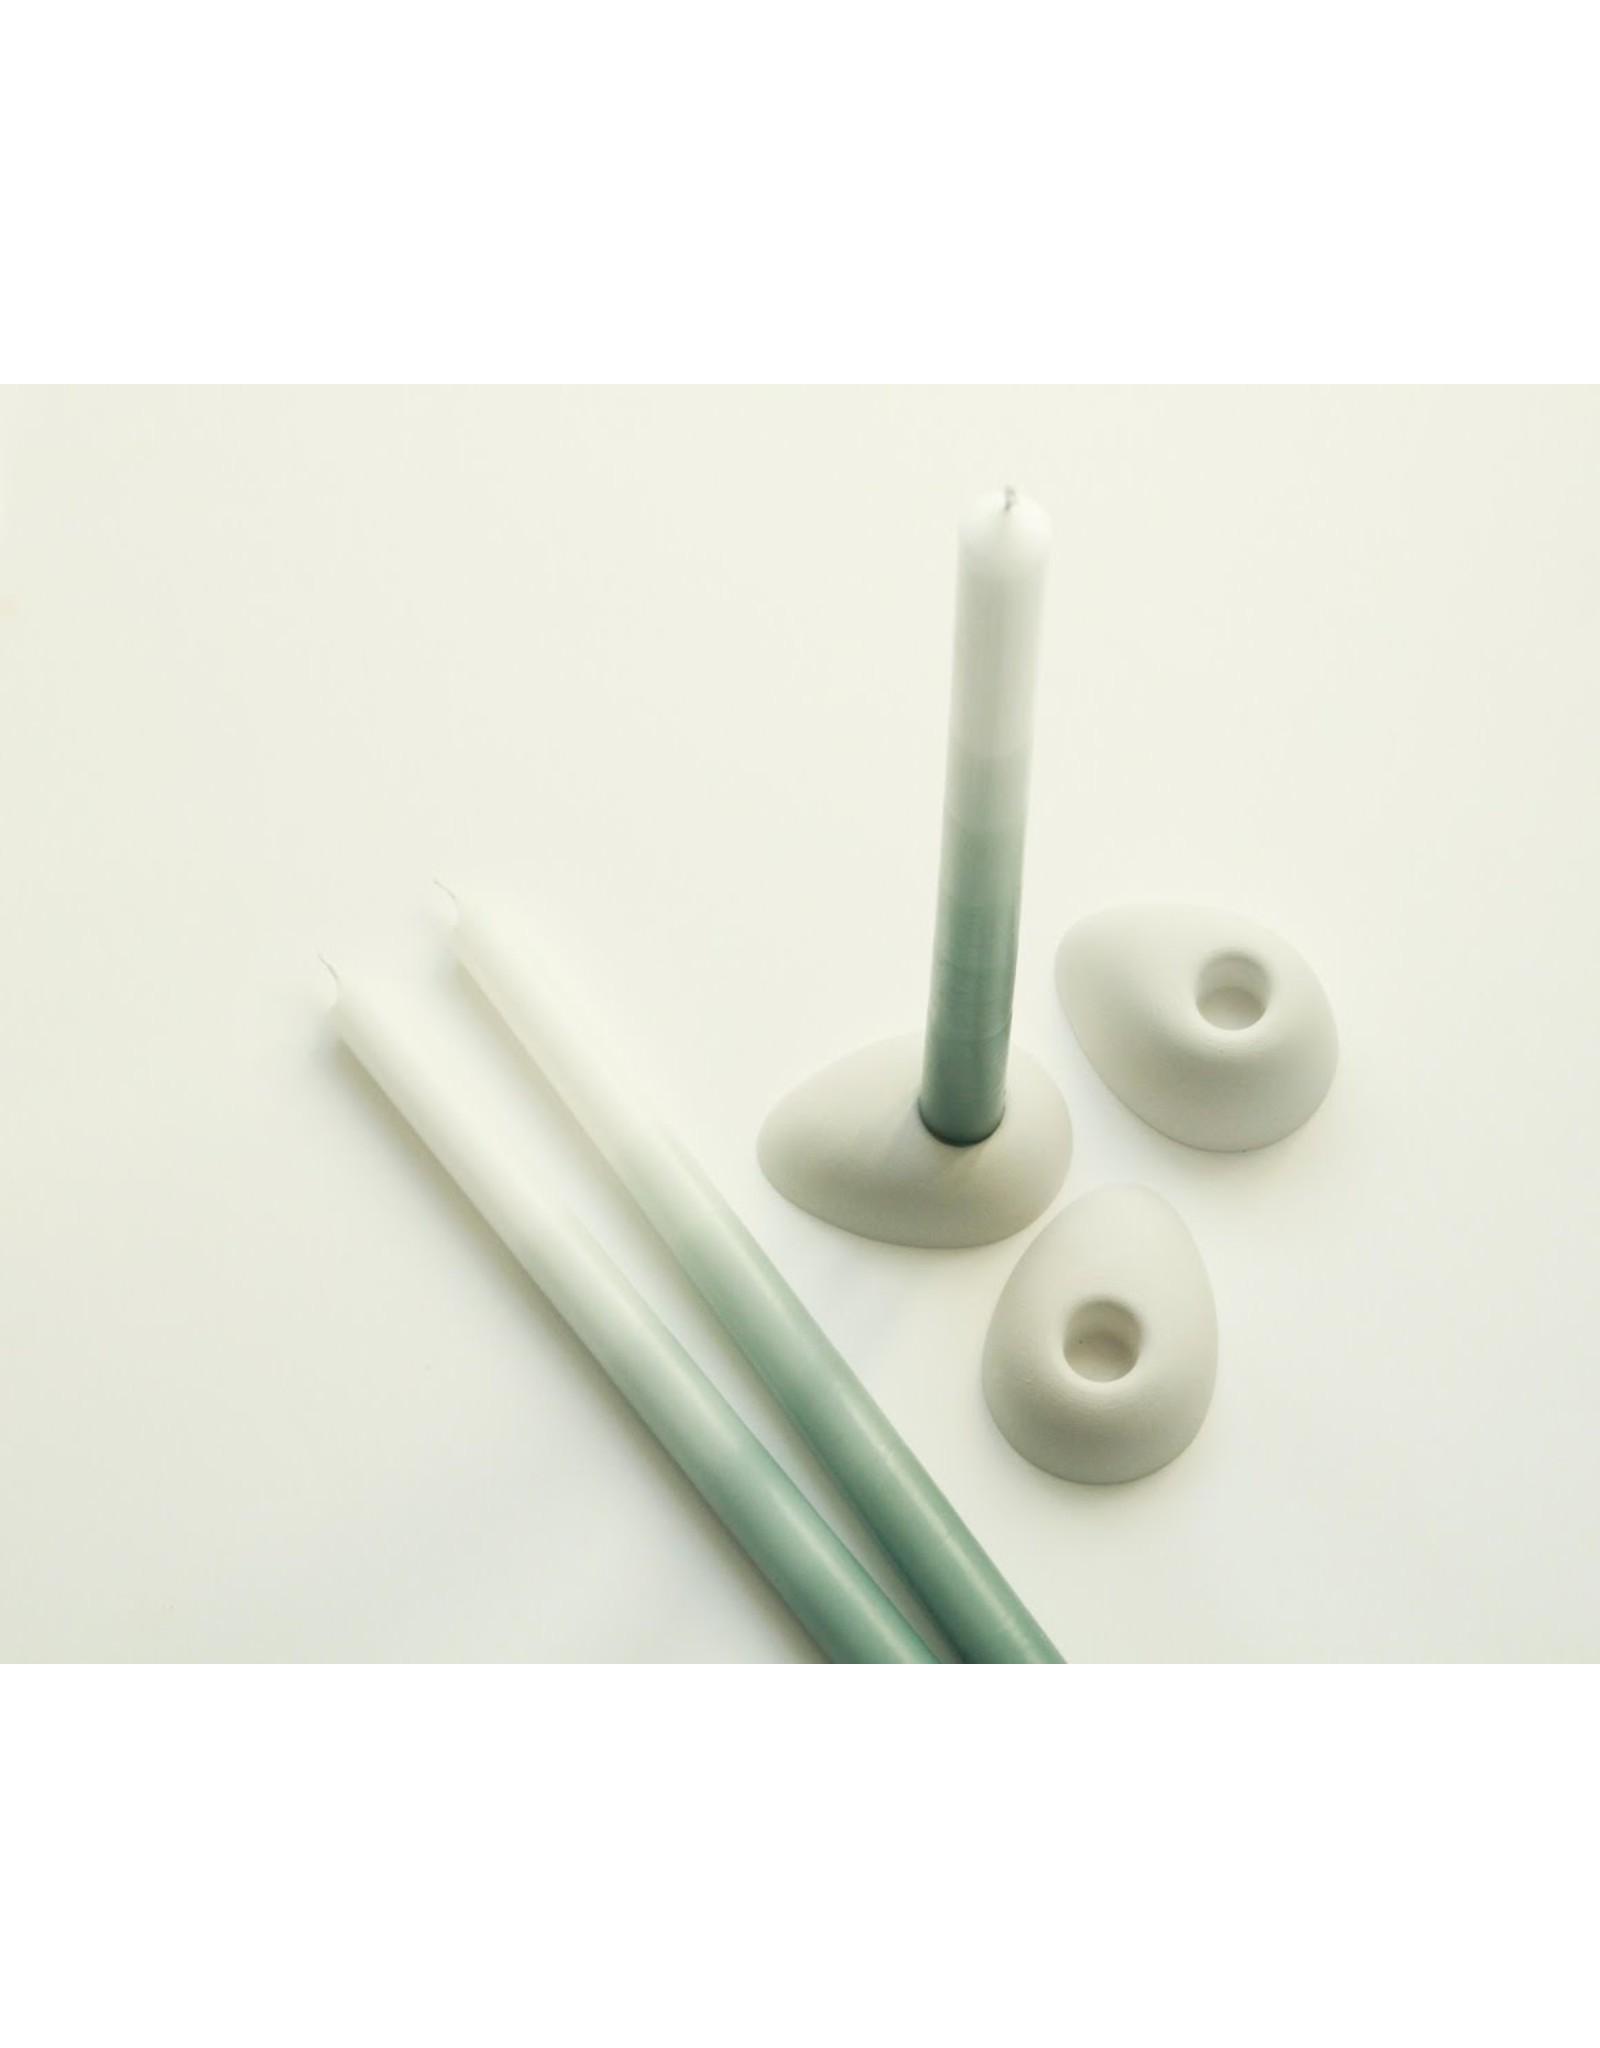 Mo Man Tai Gradient Candle (per piece) Jade Green